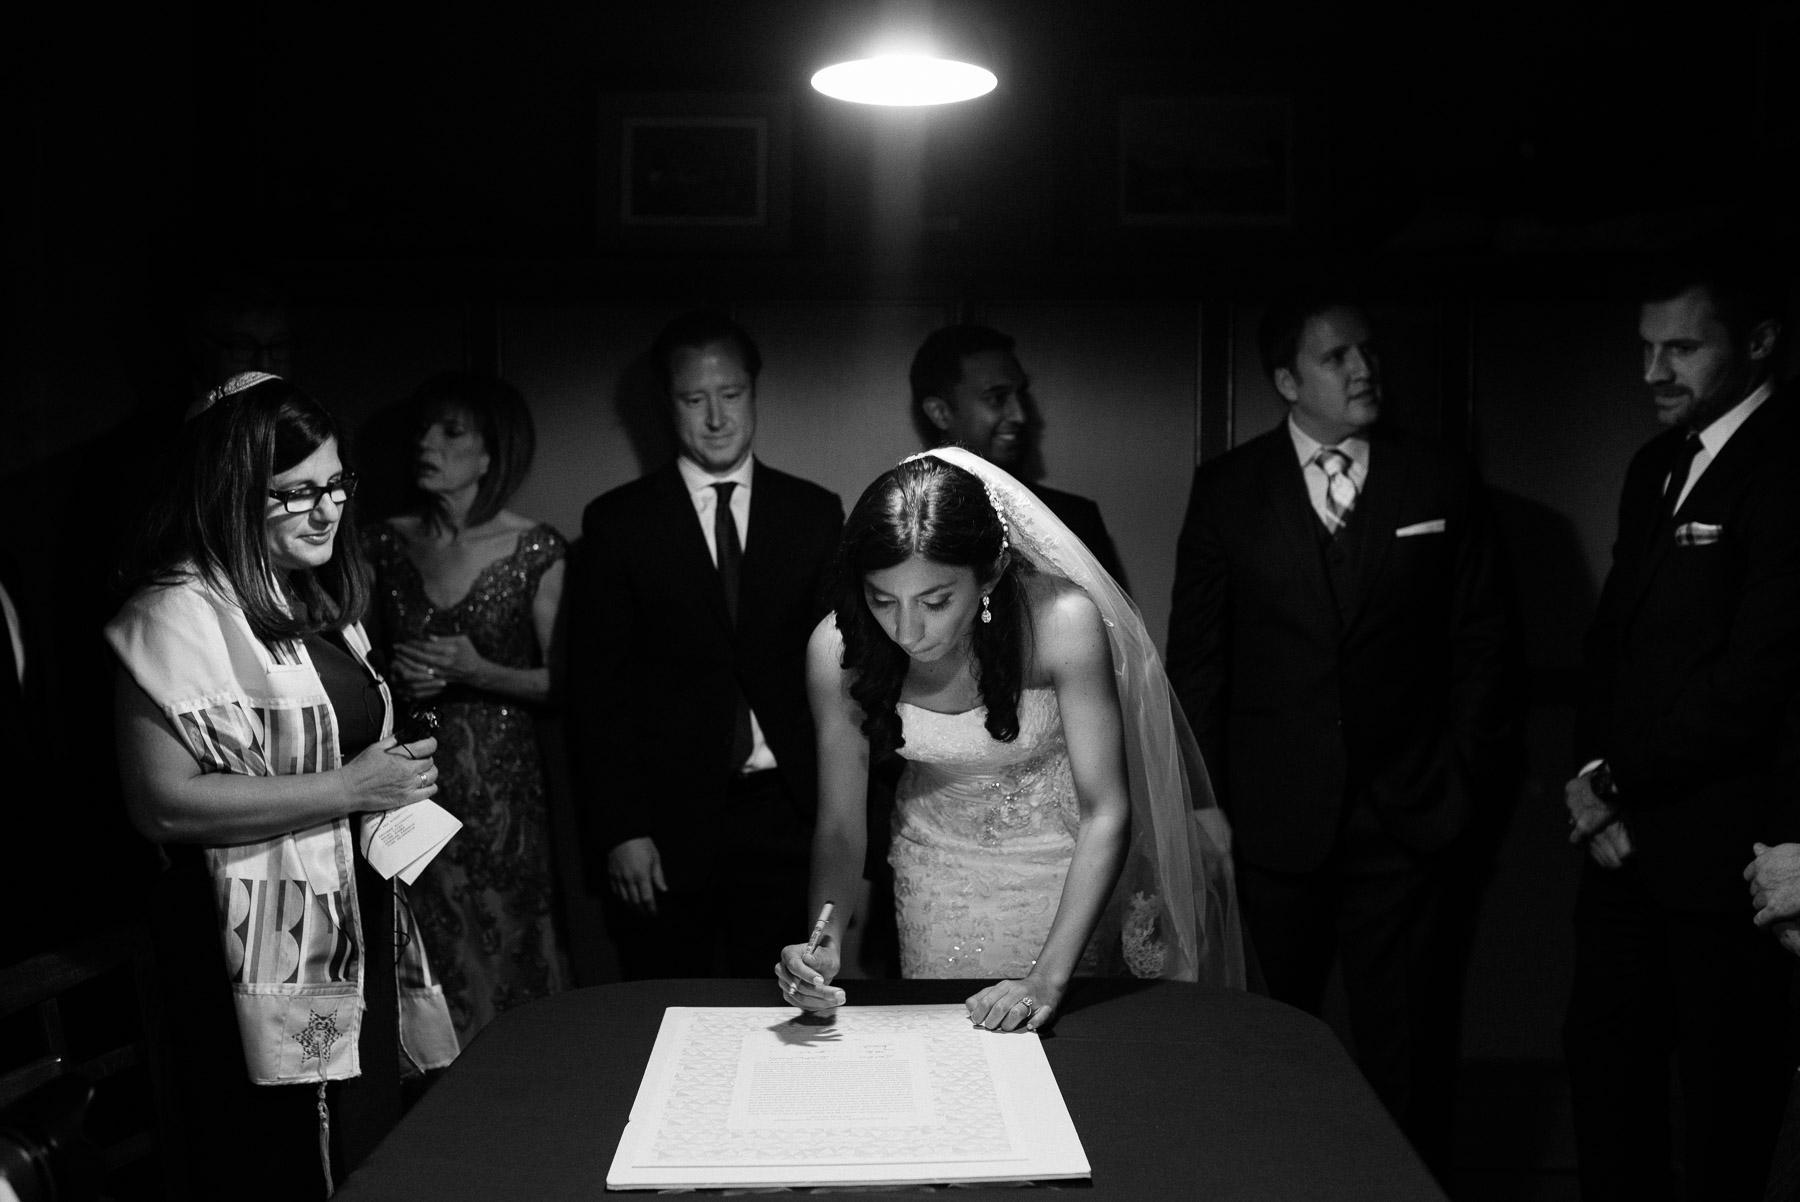 racquet-club-philadelphia-wedding-32.jpg